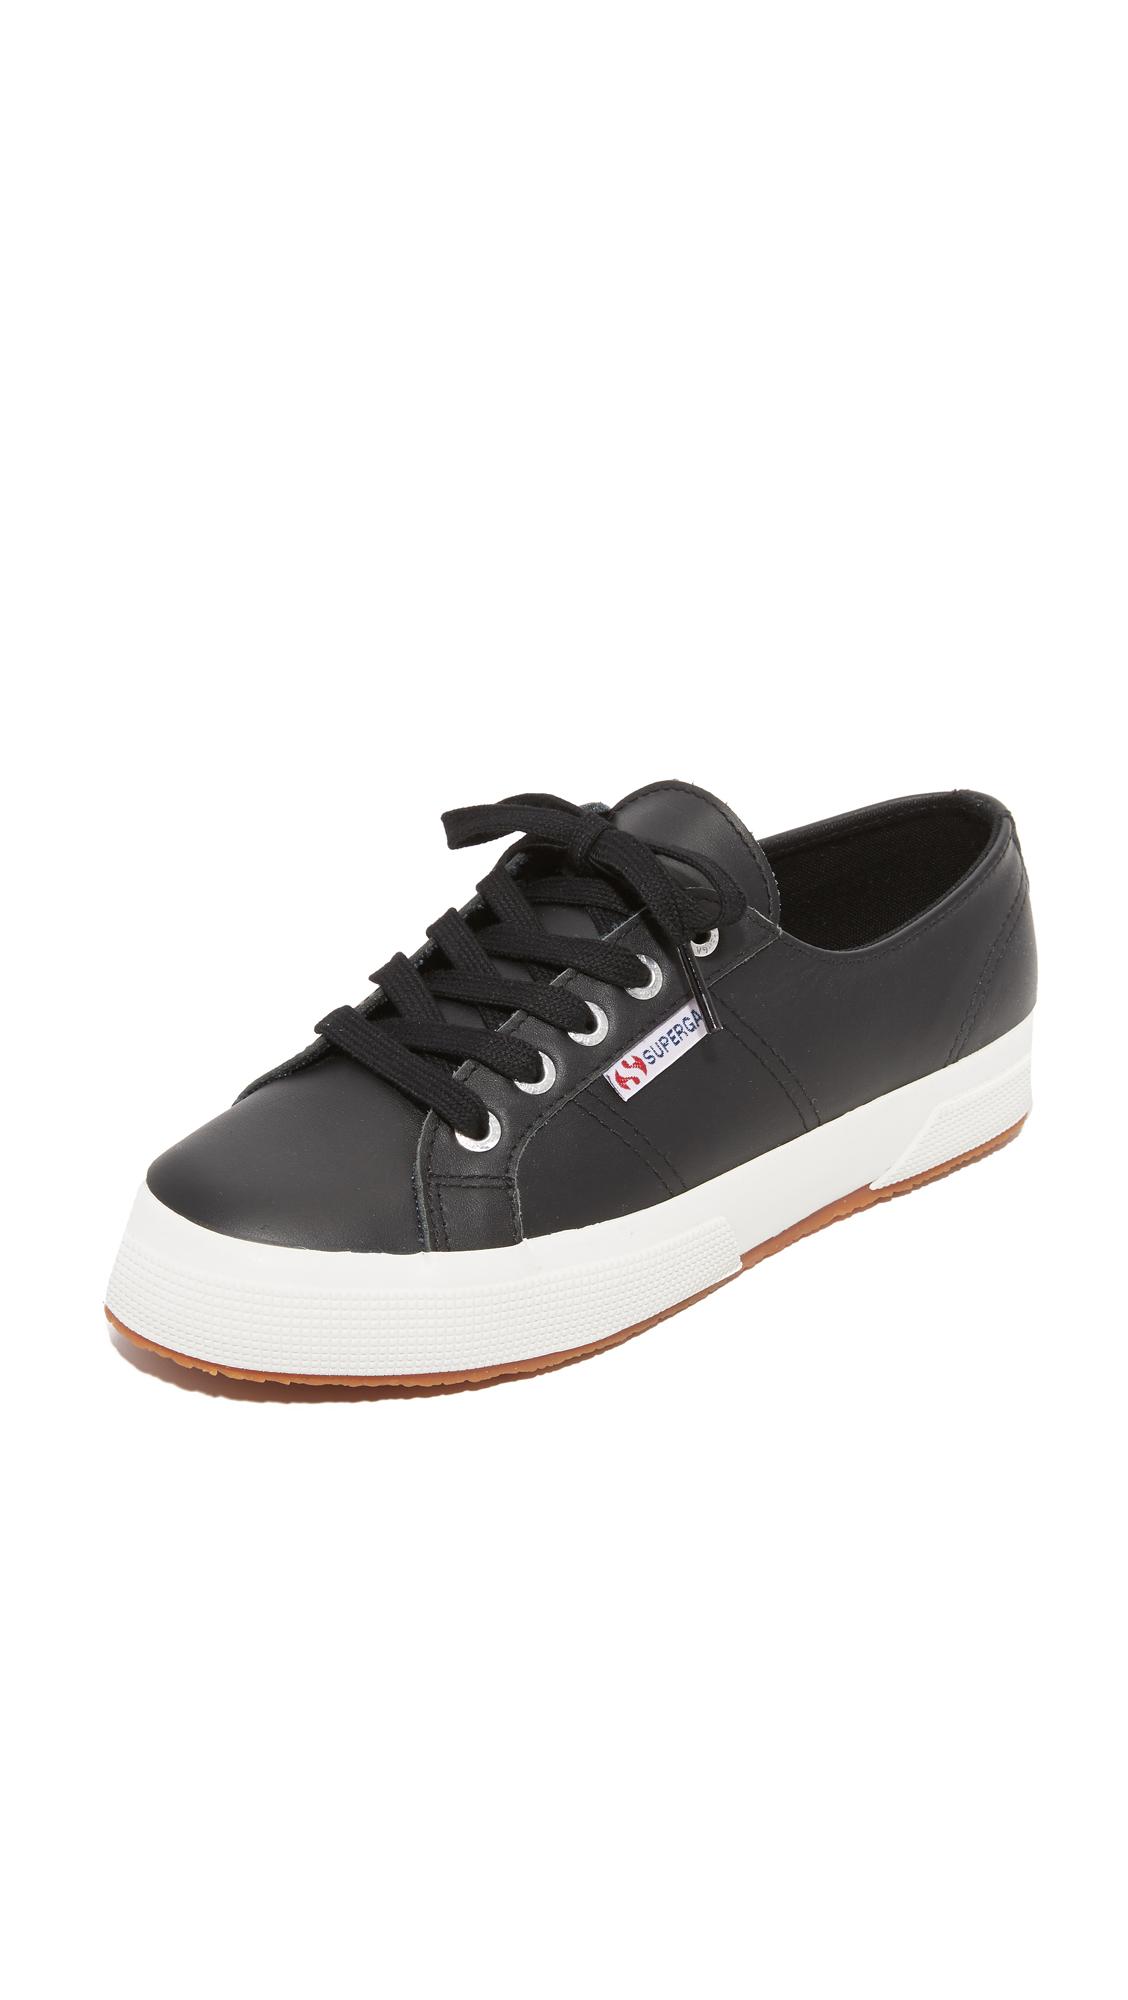 Superga 2750 FGLU Sneakers - Black